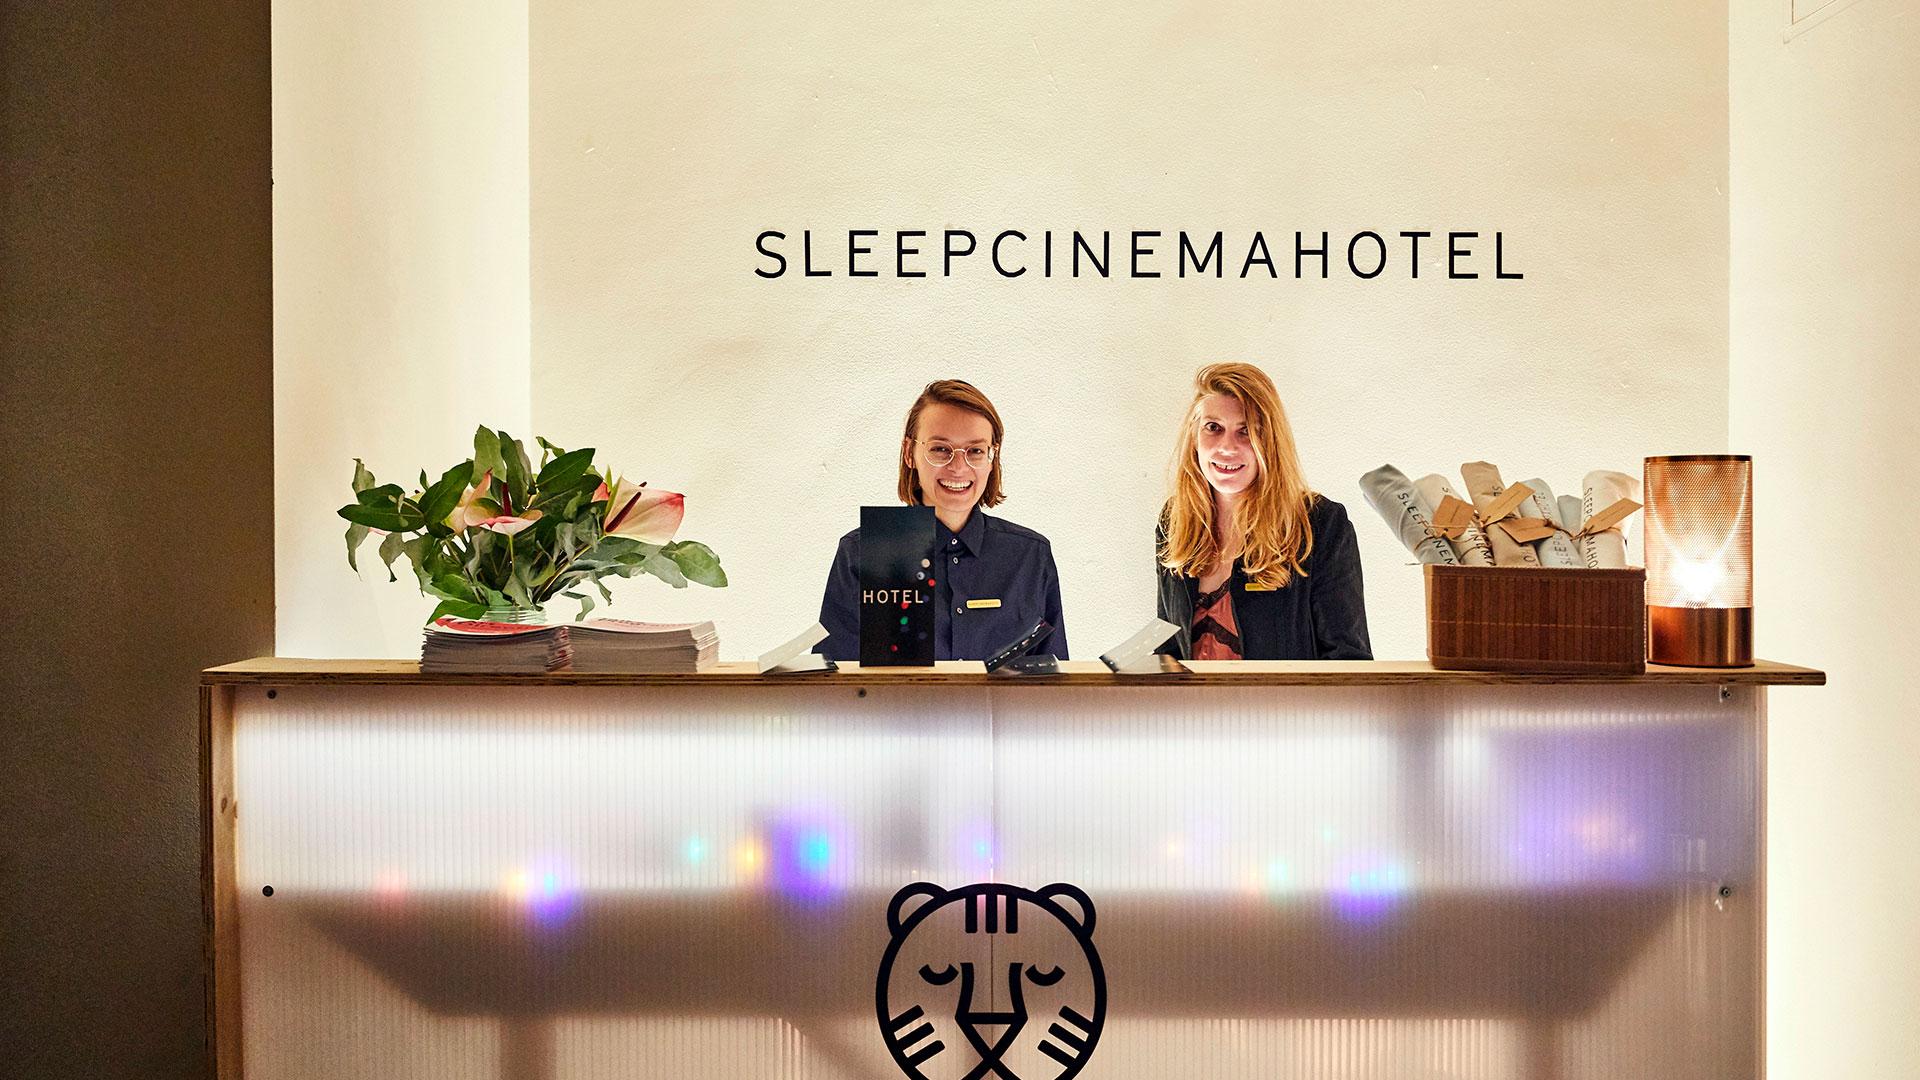 Danielle van der Kooij Portfolio Sleepcinemahotel IFFR 2018